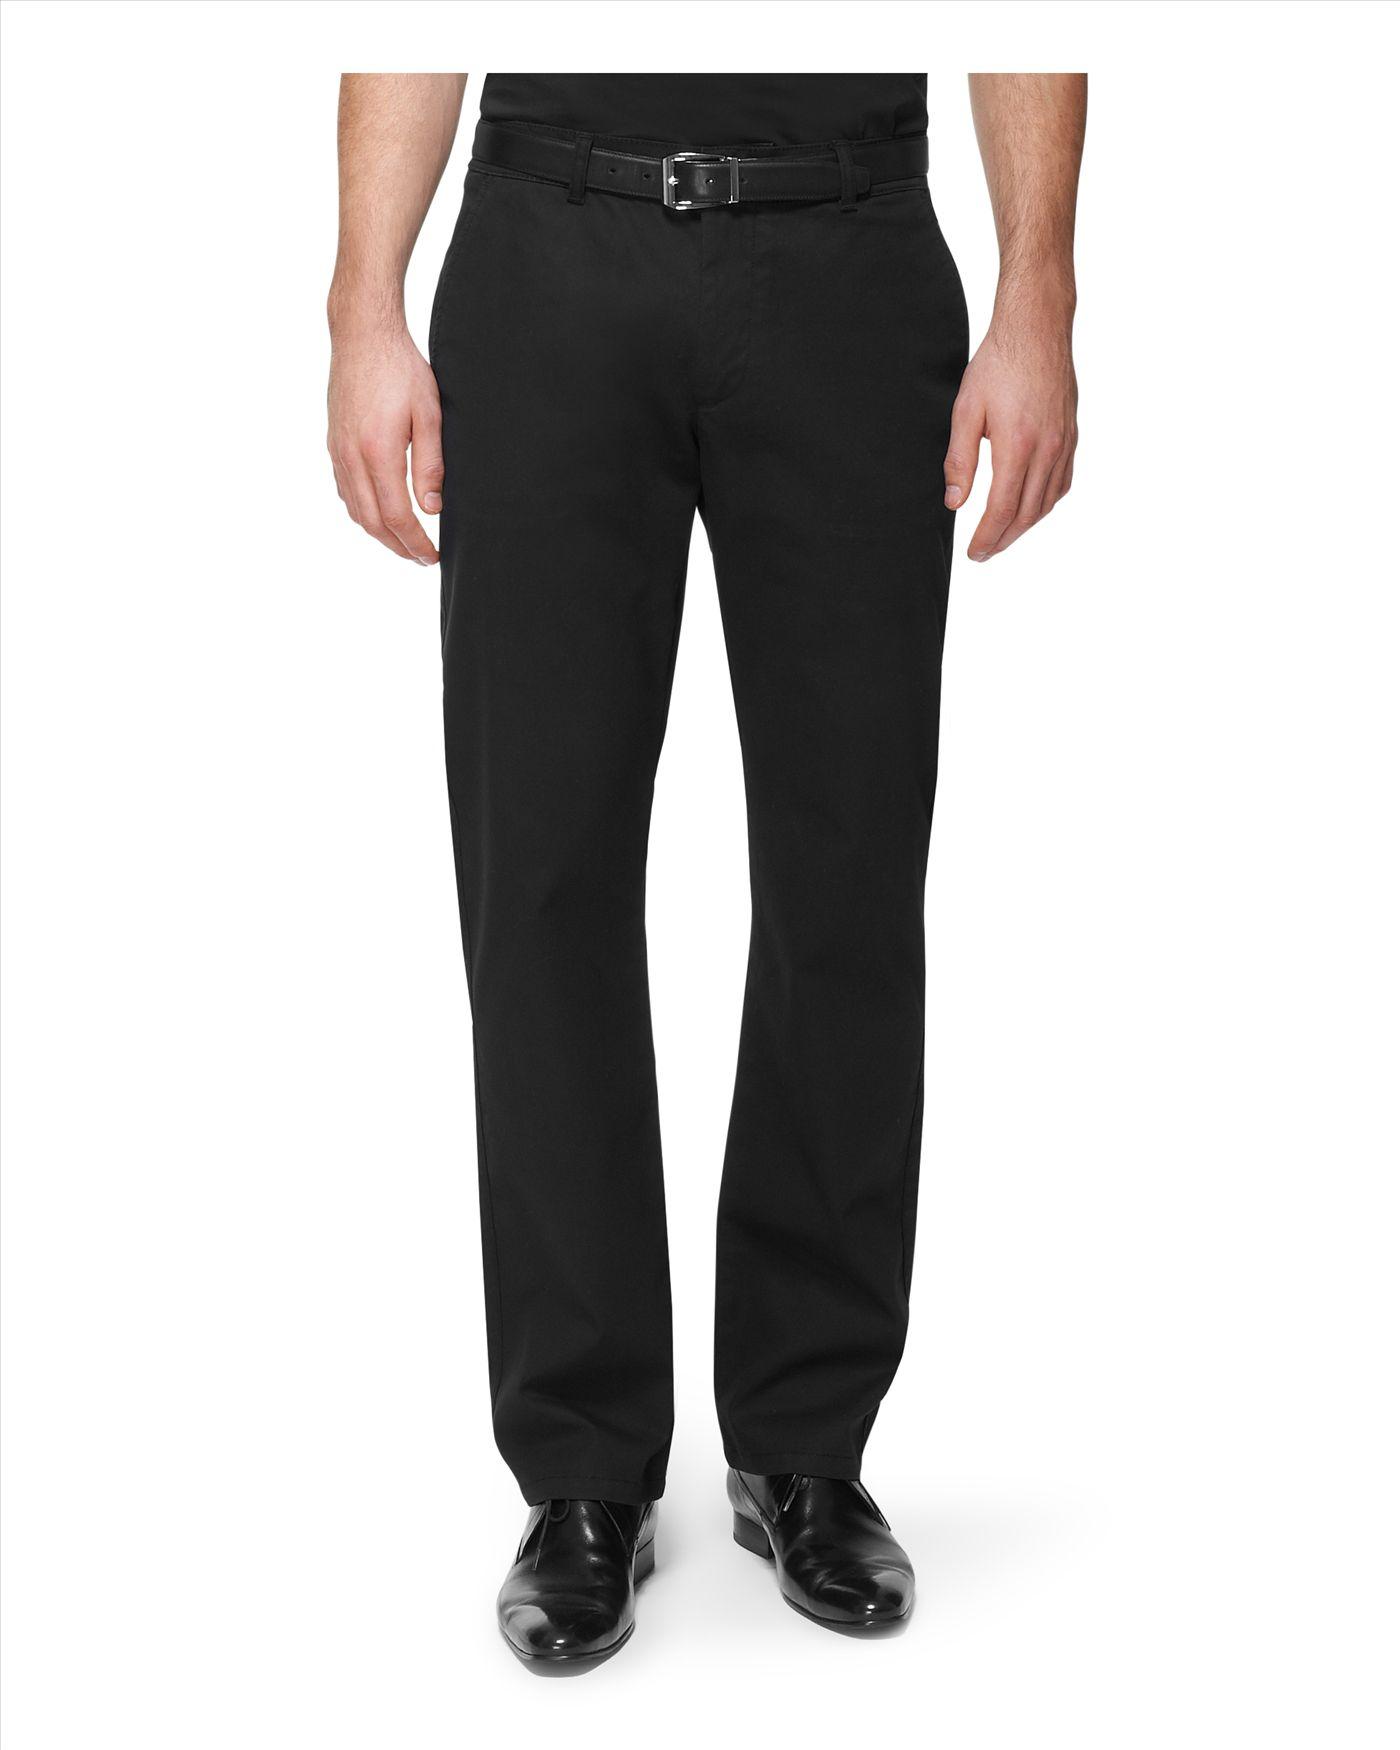 Jaeger Classic Berwick Chino in Black for Men